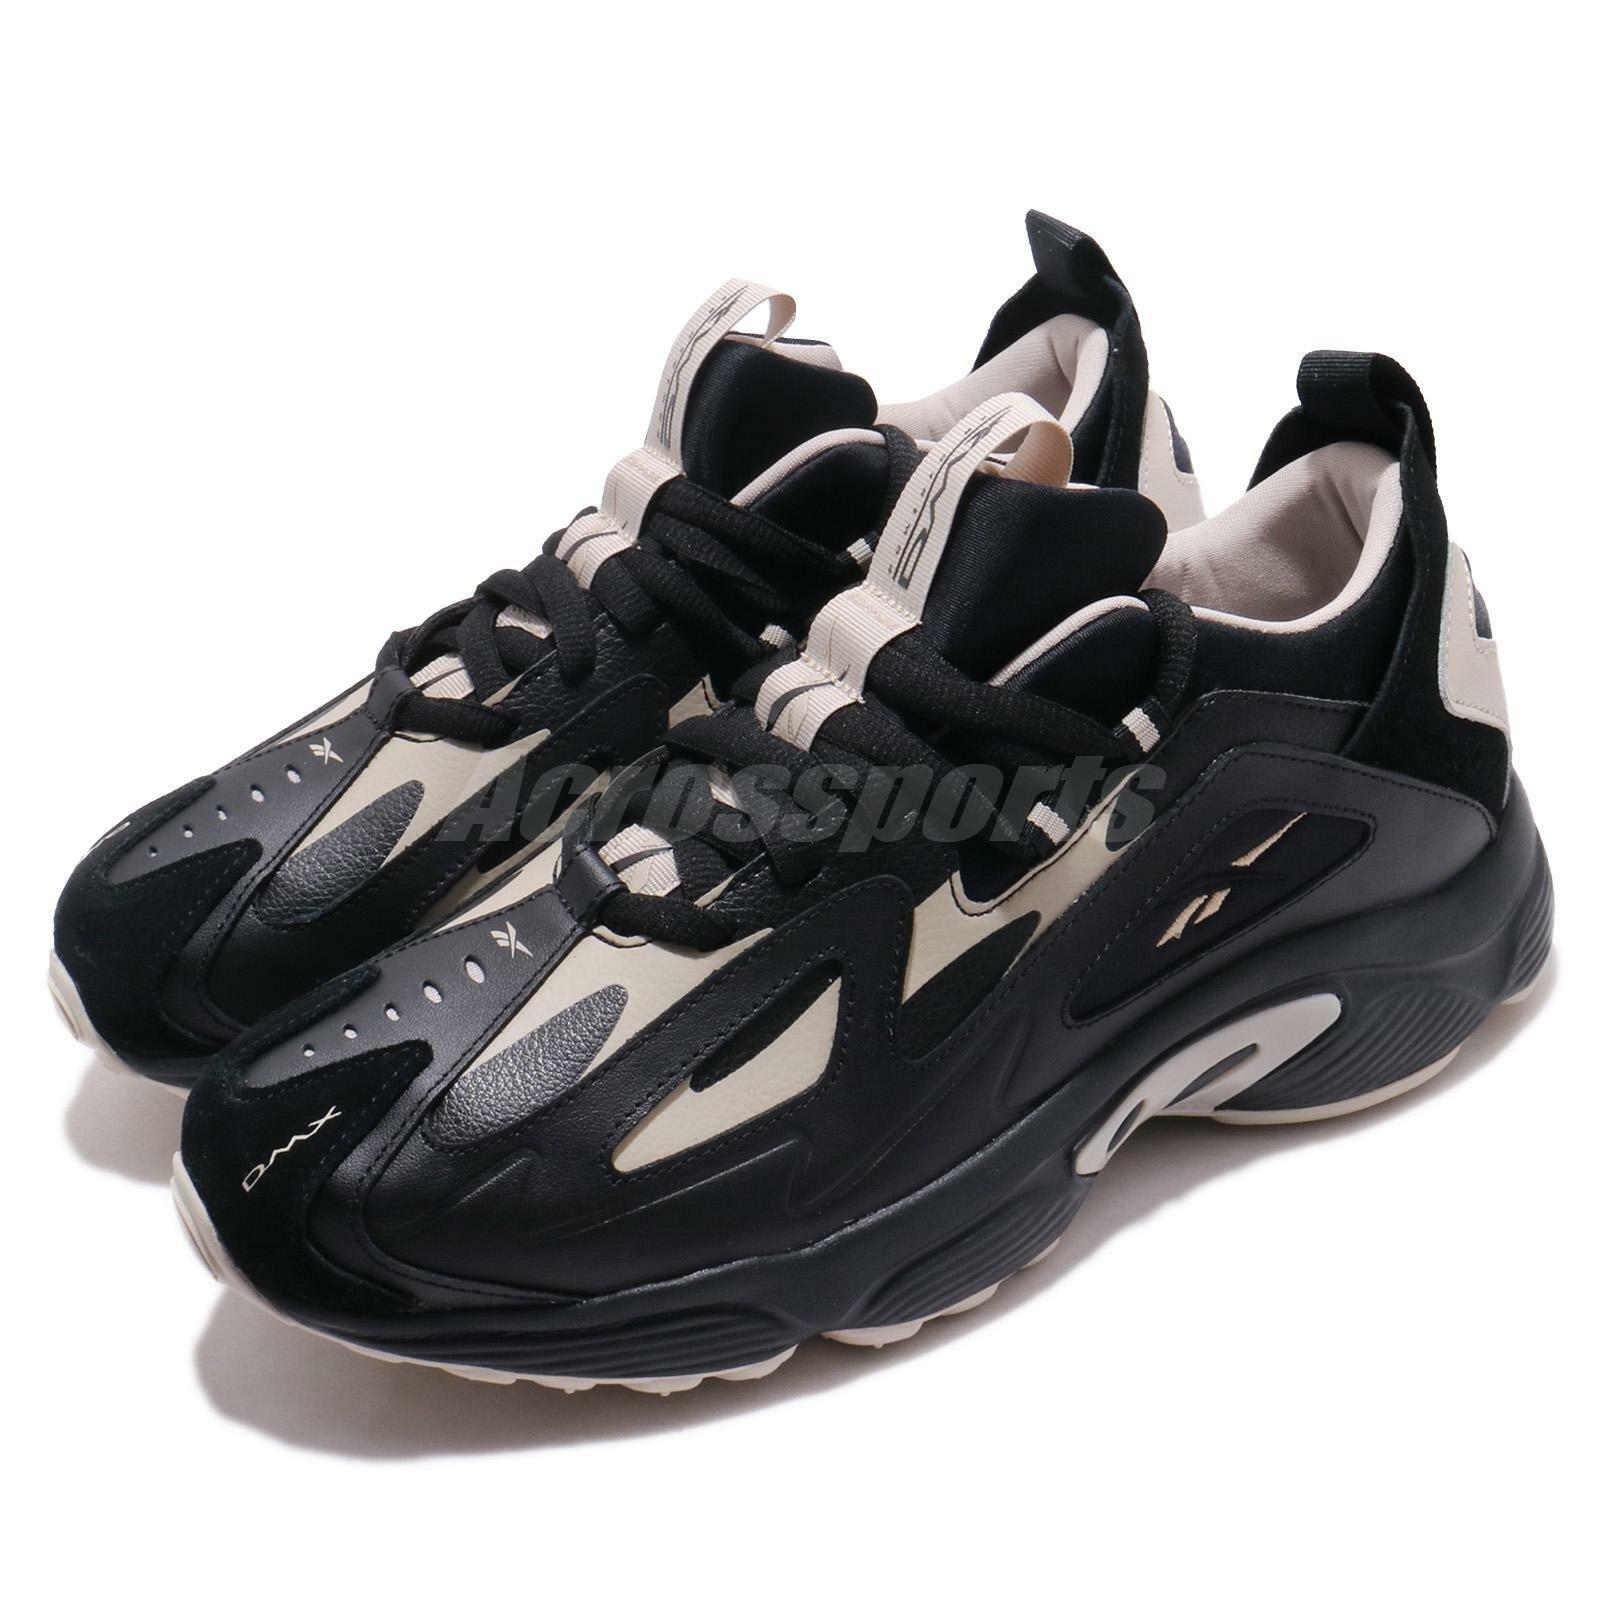 Reebok DMX Series 1200 LT negro Sand Men Running Daddy zapatos zapatillas DV9234